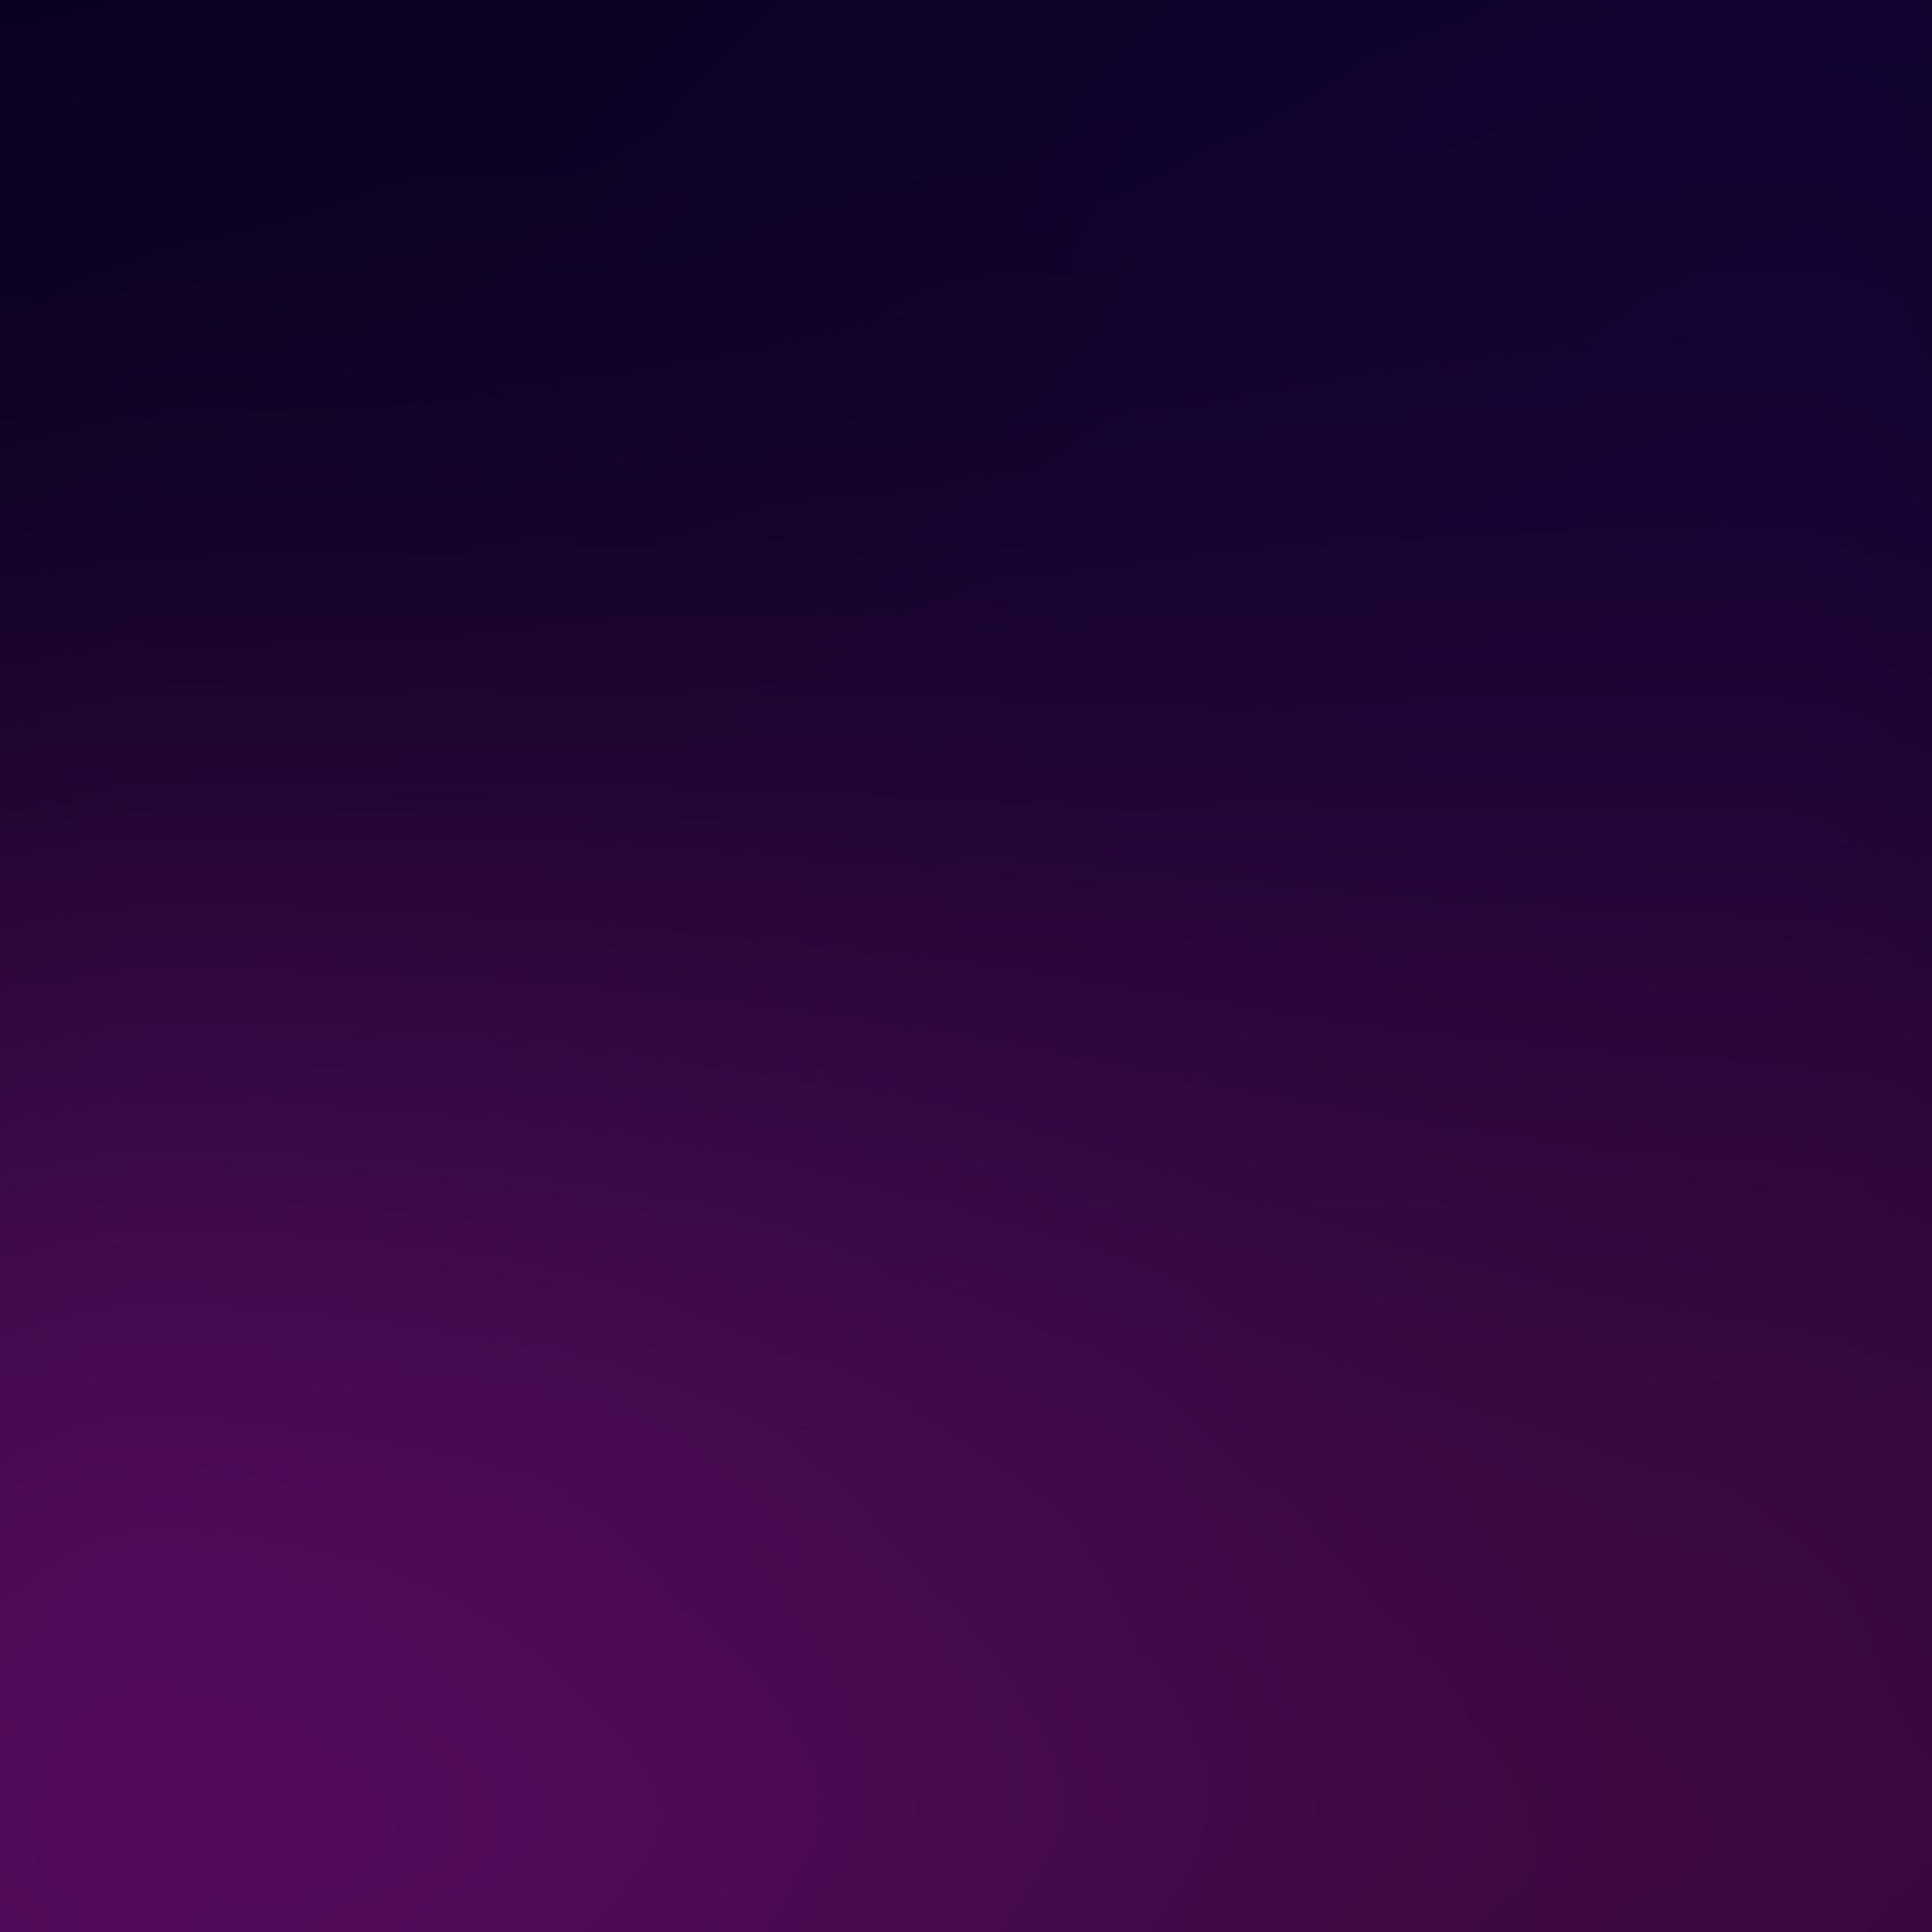 Plain Color Wallpaper For Iphone Sk61 Dark Purple Blur Gradation Wallpaper